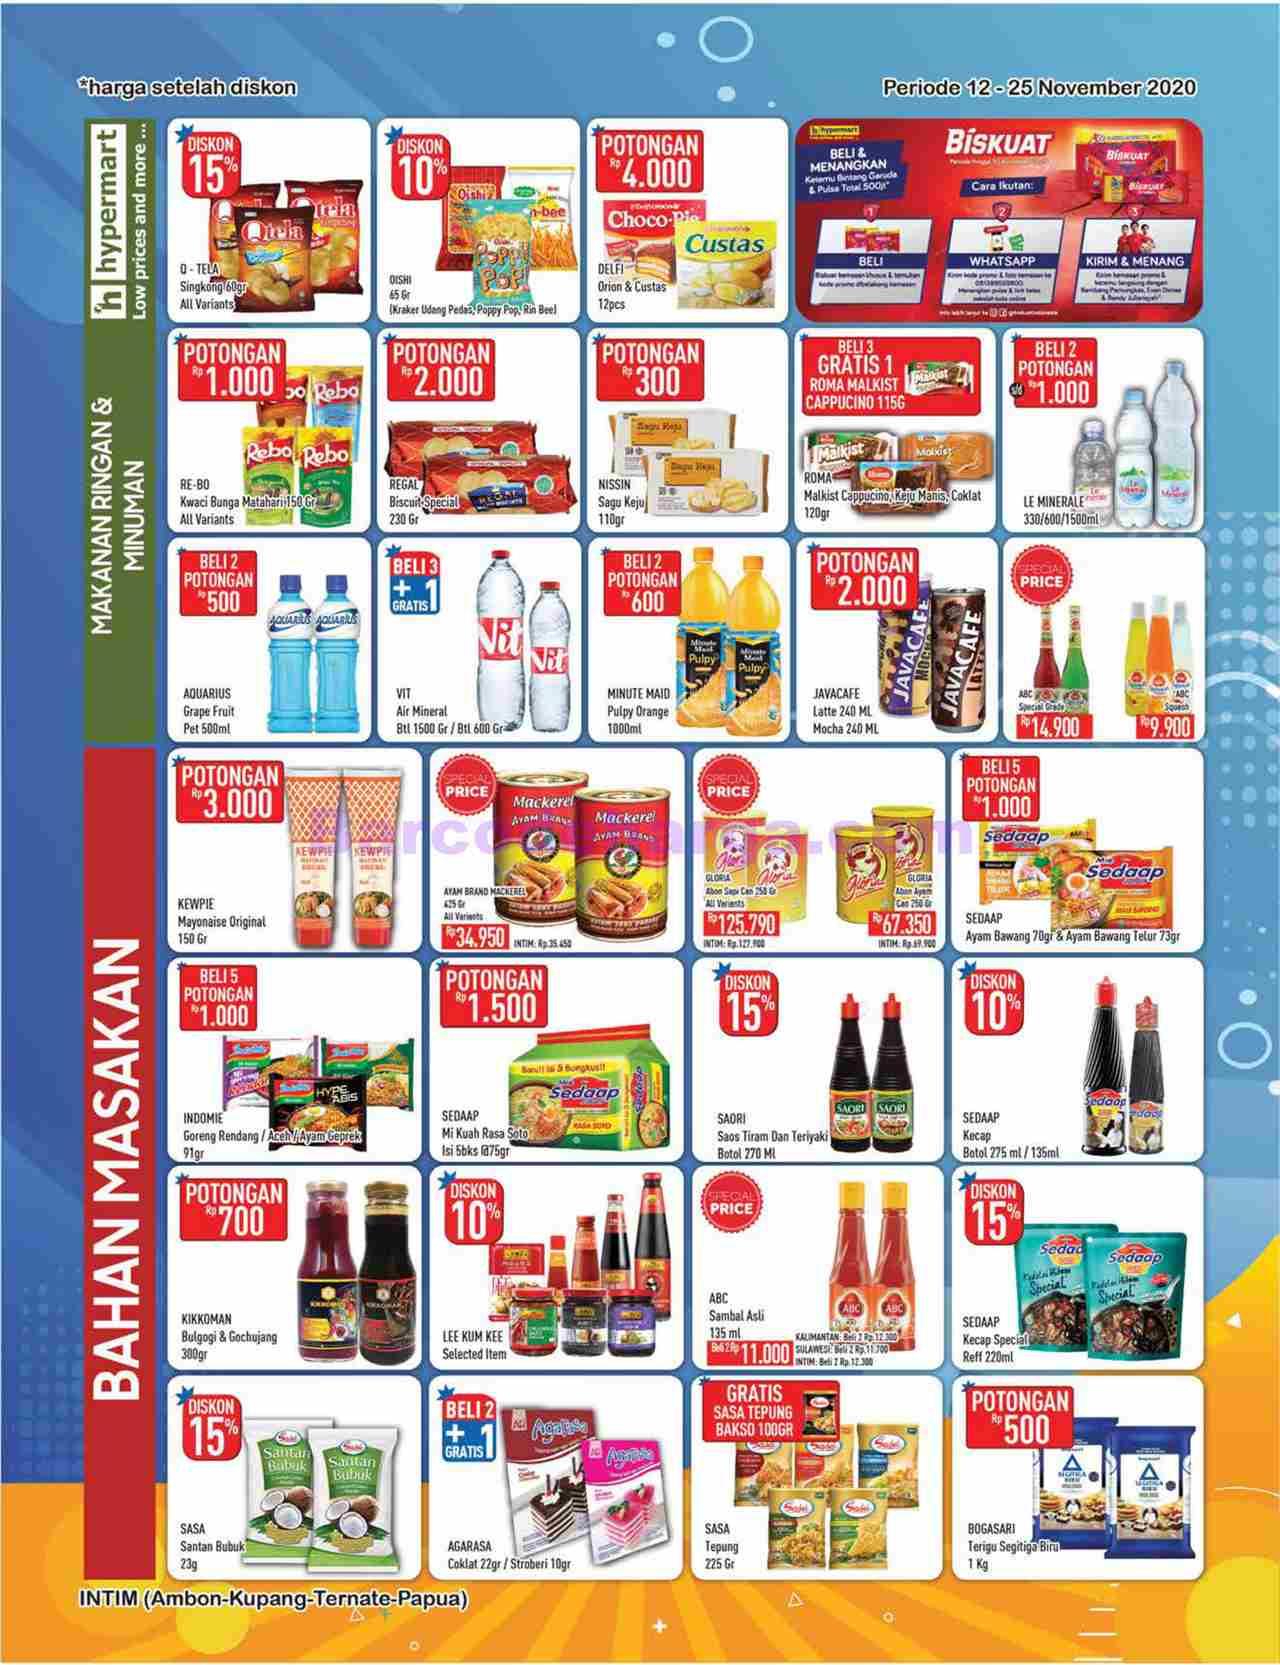 Katalog Promo Hypermart Awal Bulan 12 25november 2020 Barcodeharga Harga Promo Alfamart Indomaret Giant Hypermart Superindo Lottemart Carrefour